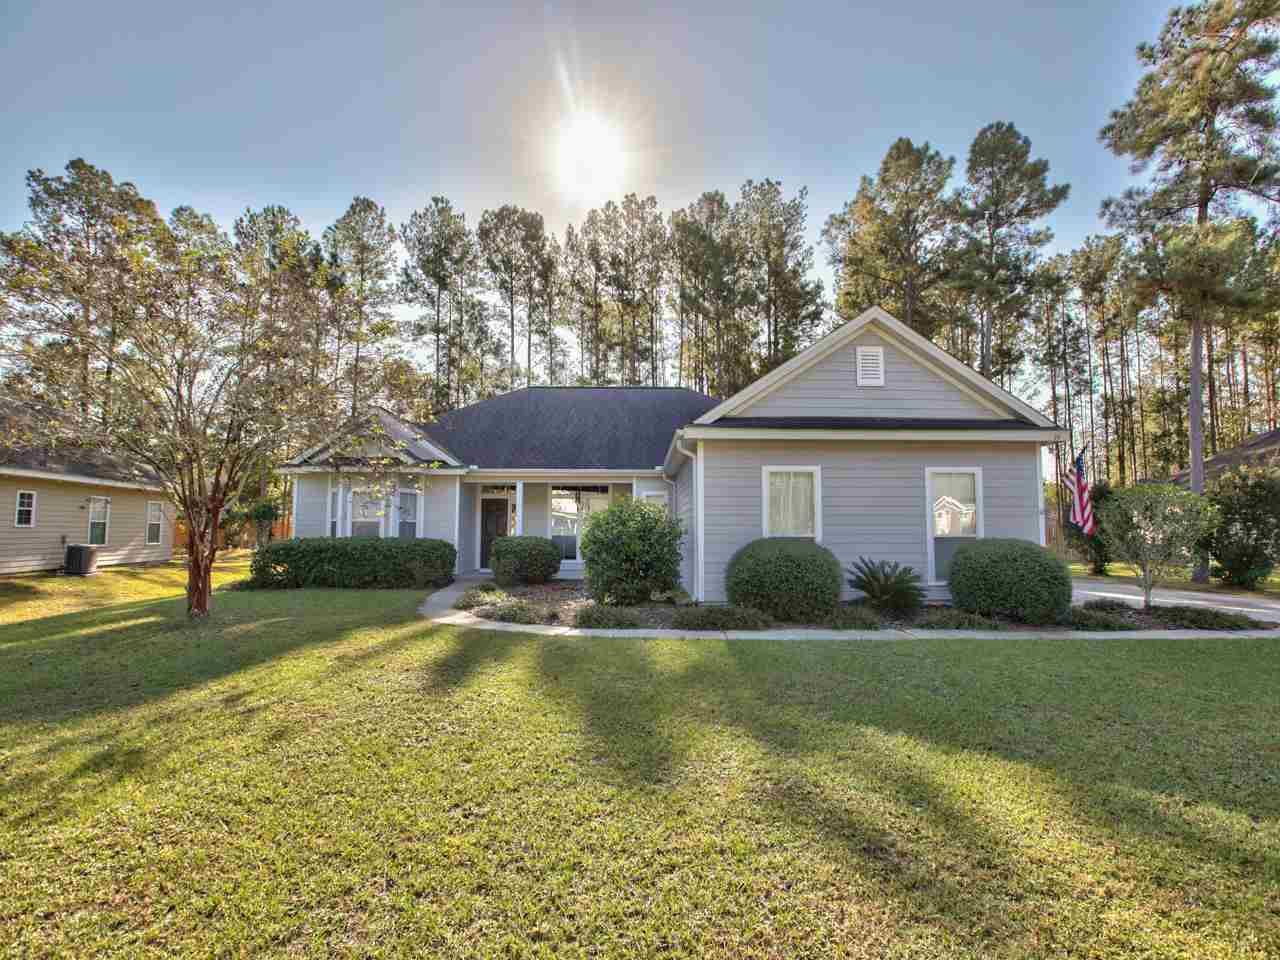 19 Purple Martin Cove, Crawfordville, FL 32327 - MLS#: 325749